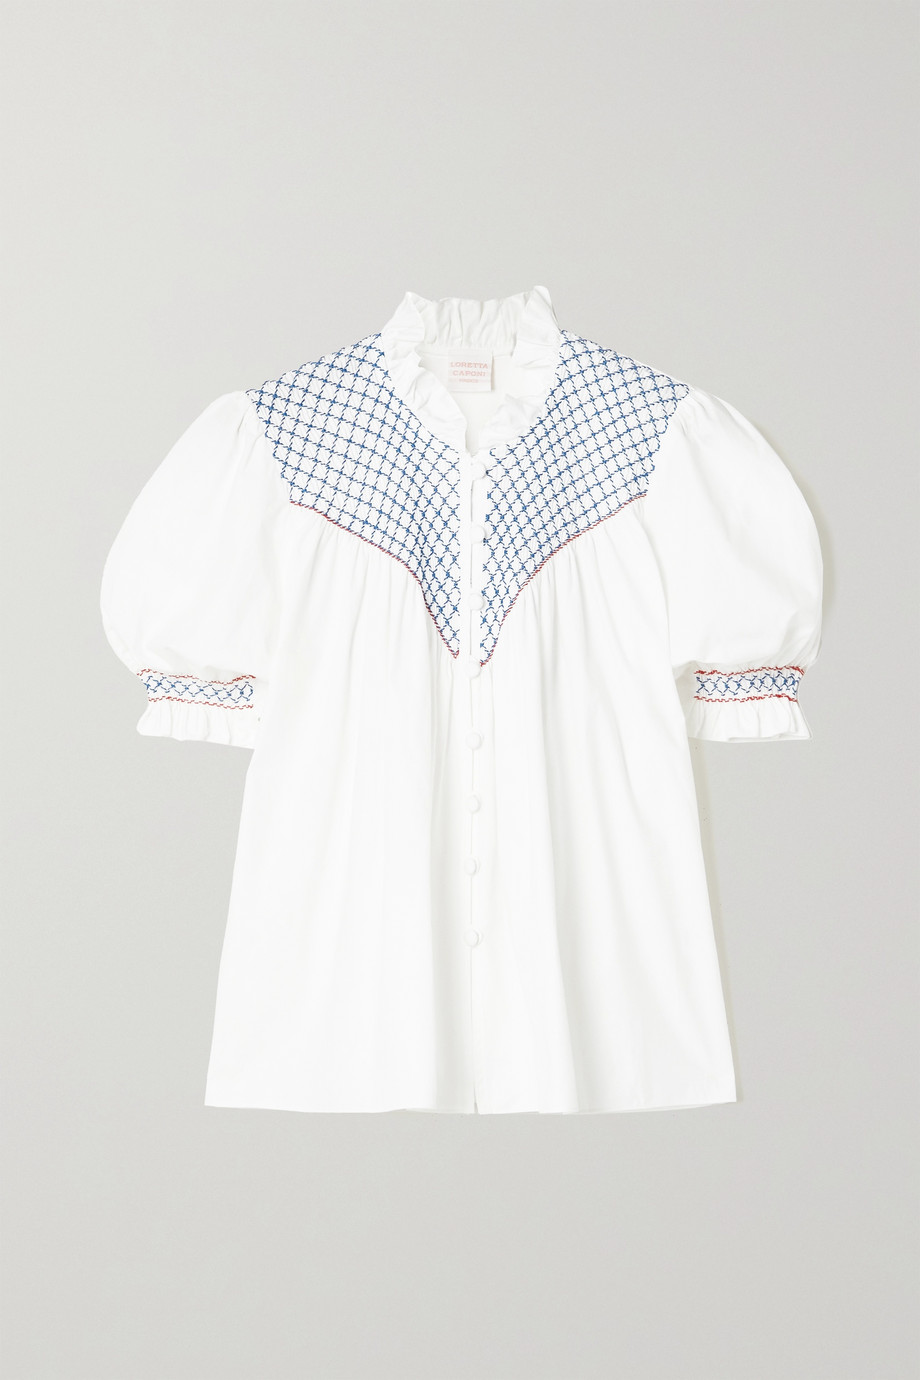 Loretta Caponi Milvia ruffled smocked poplin blouse